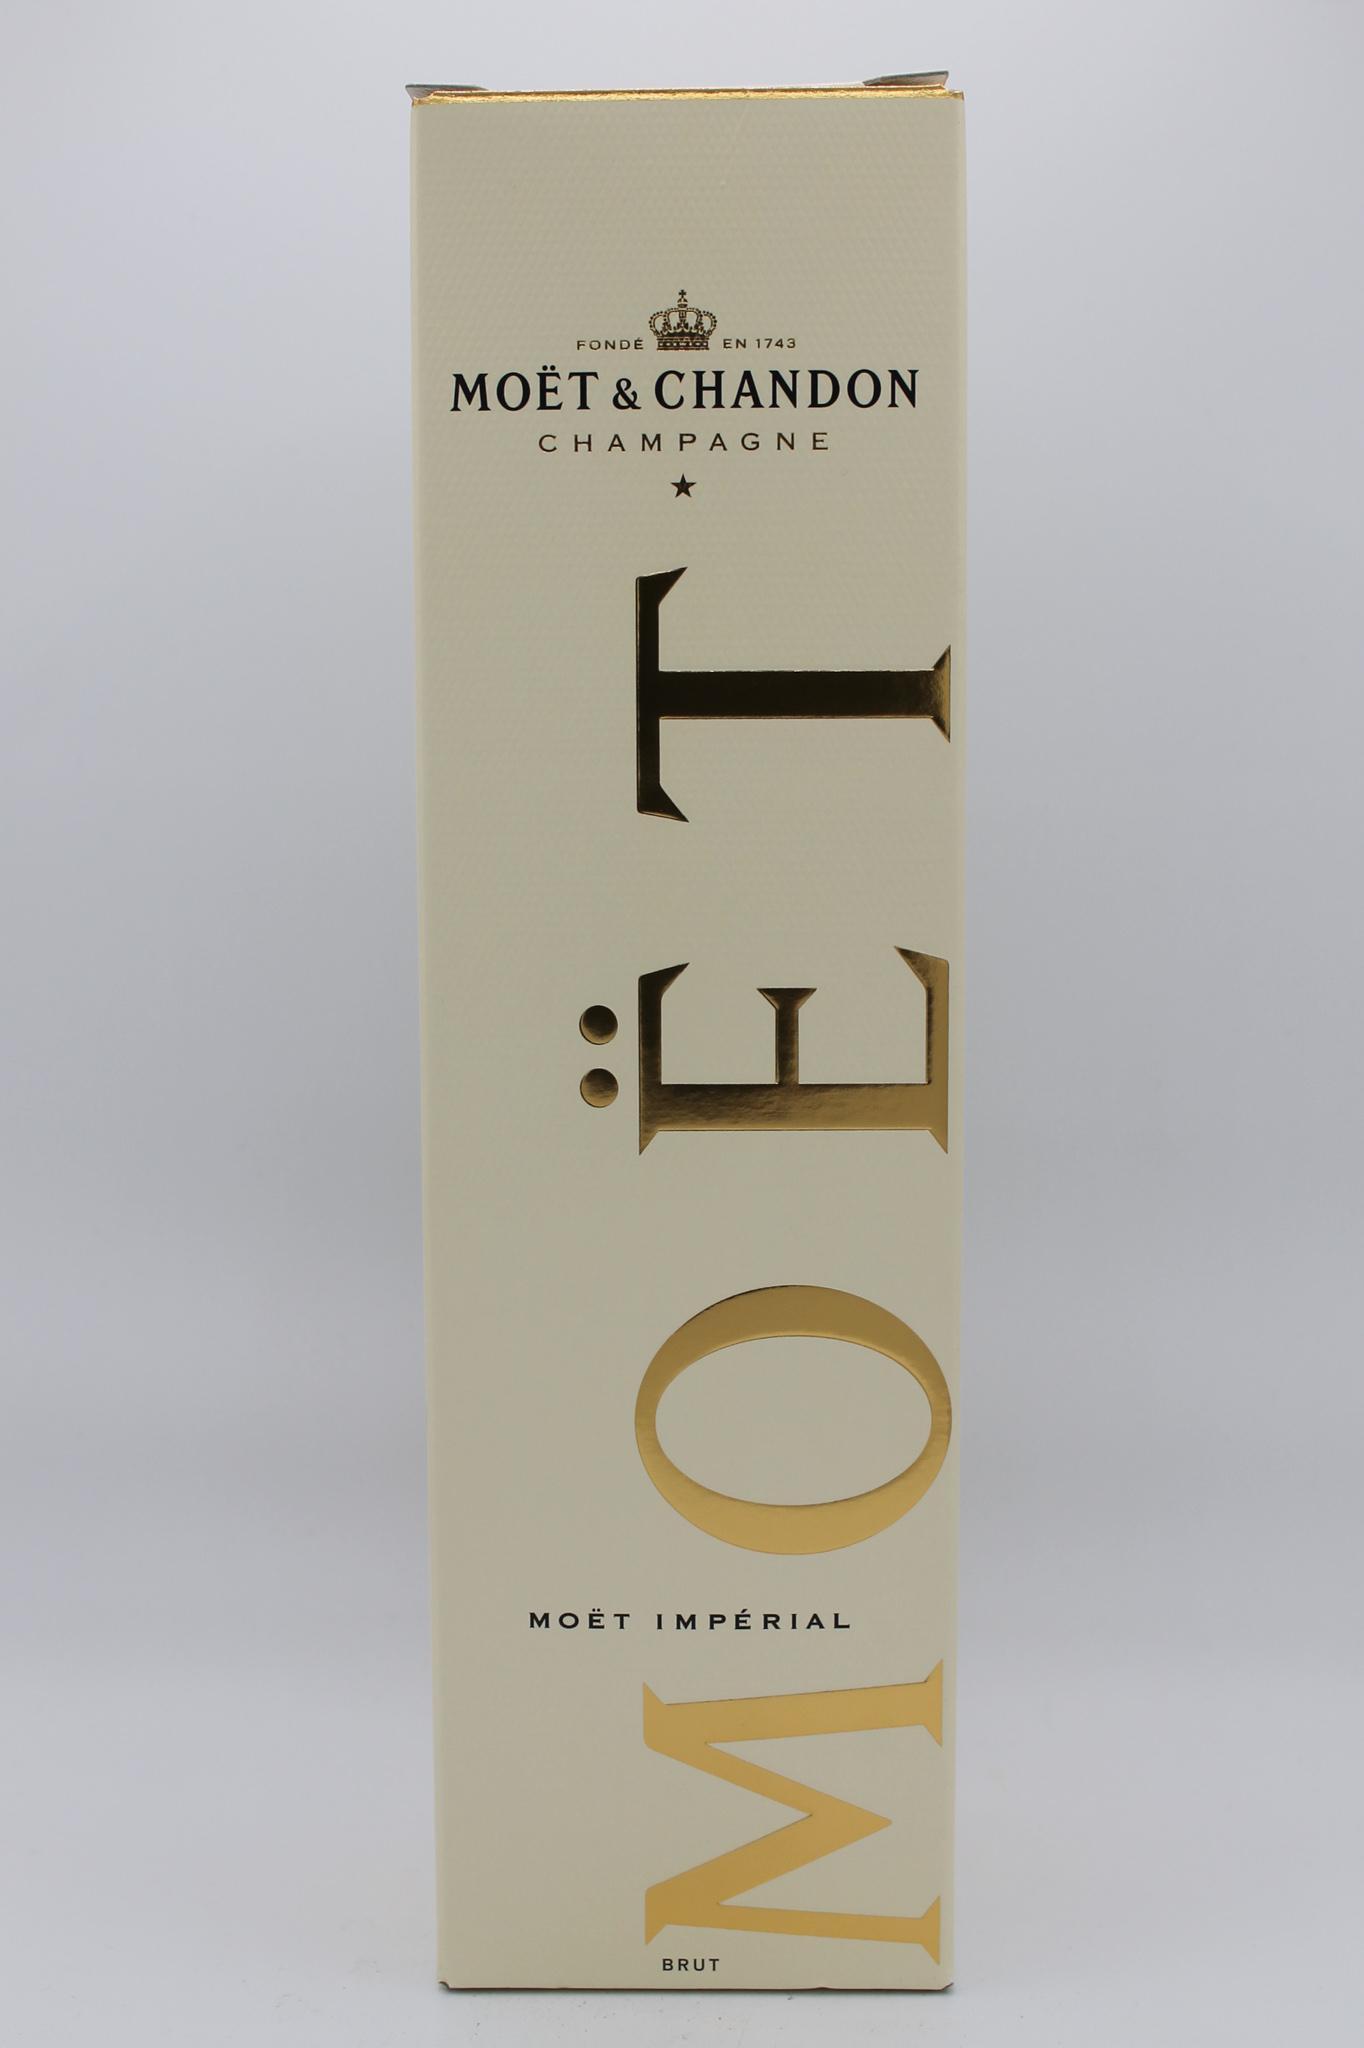 Moët & Chandon champagne brut imperial 750ml.